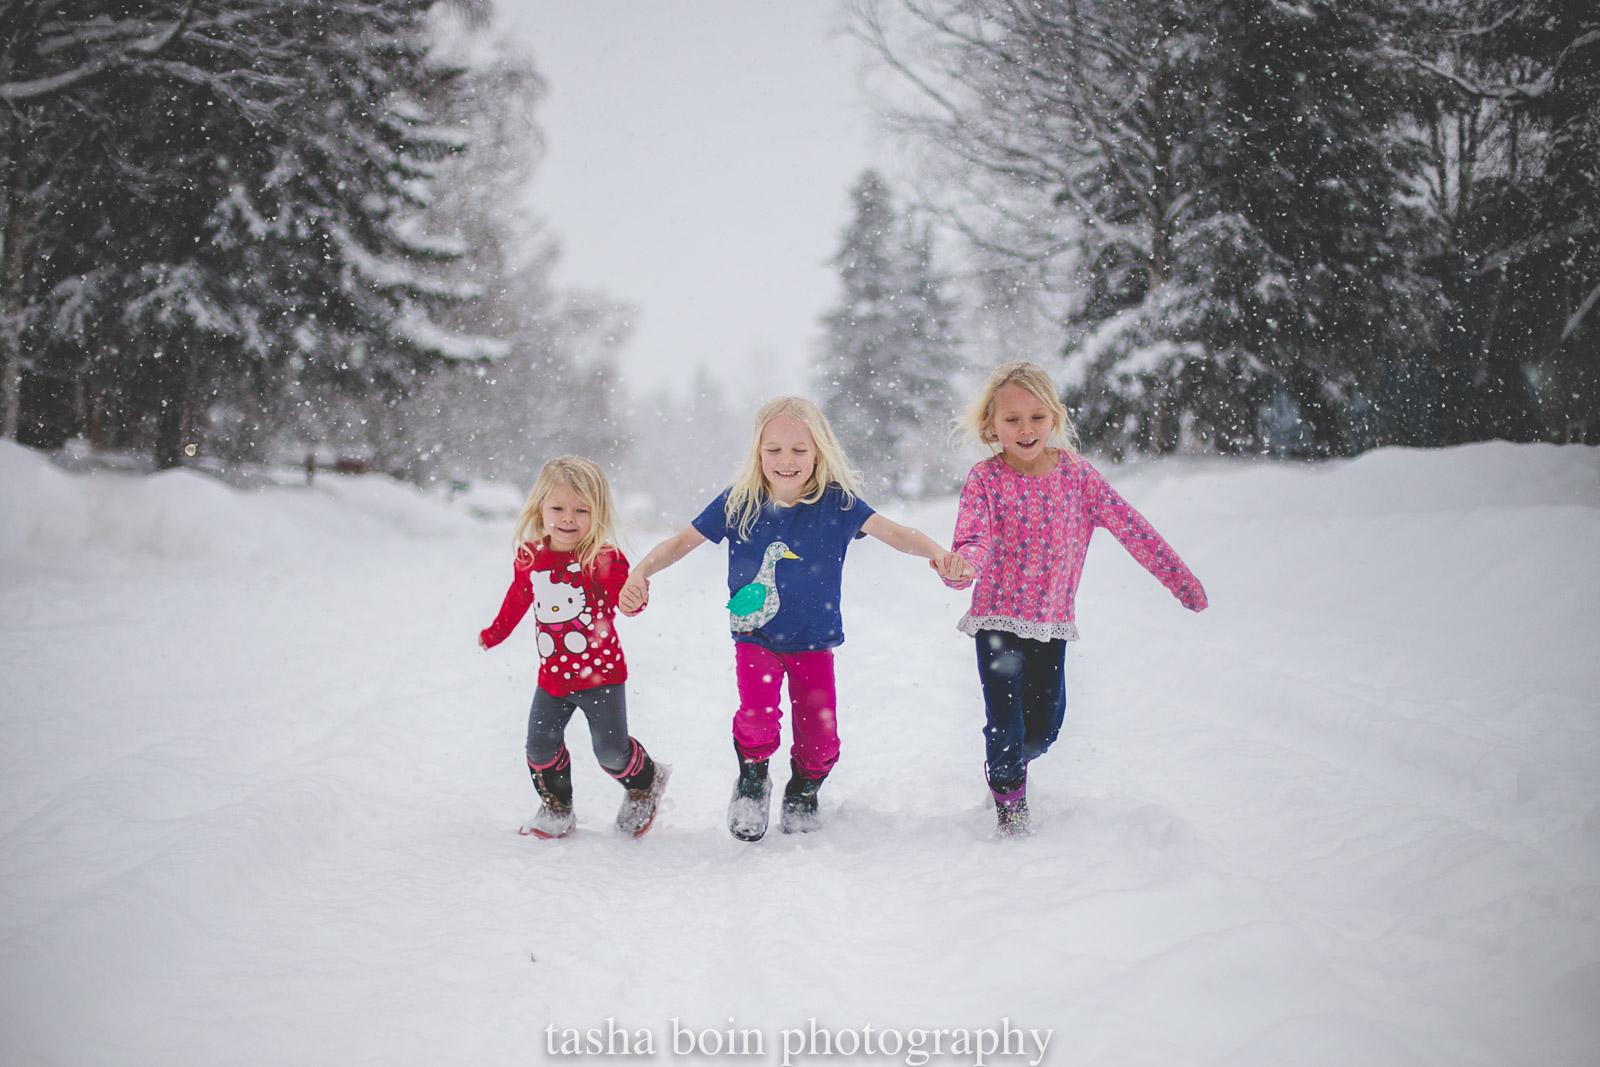 photo-of-3-girls-running-in-the-snow-by-Tasha-Boin.jpg